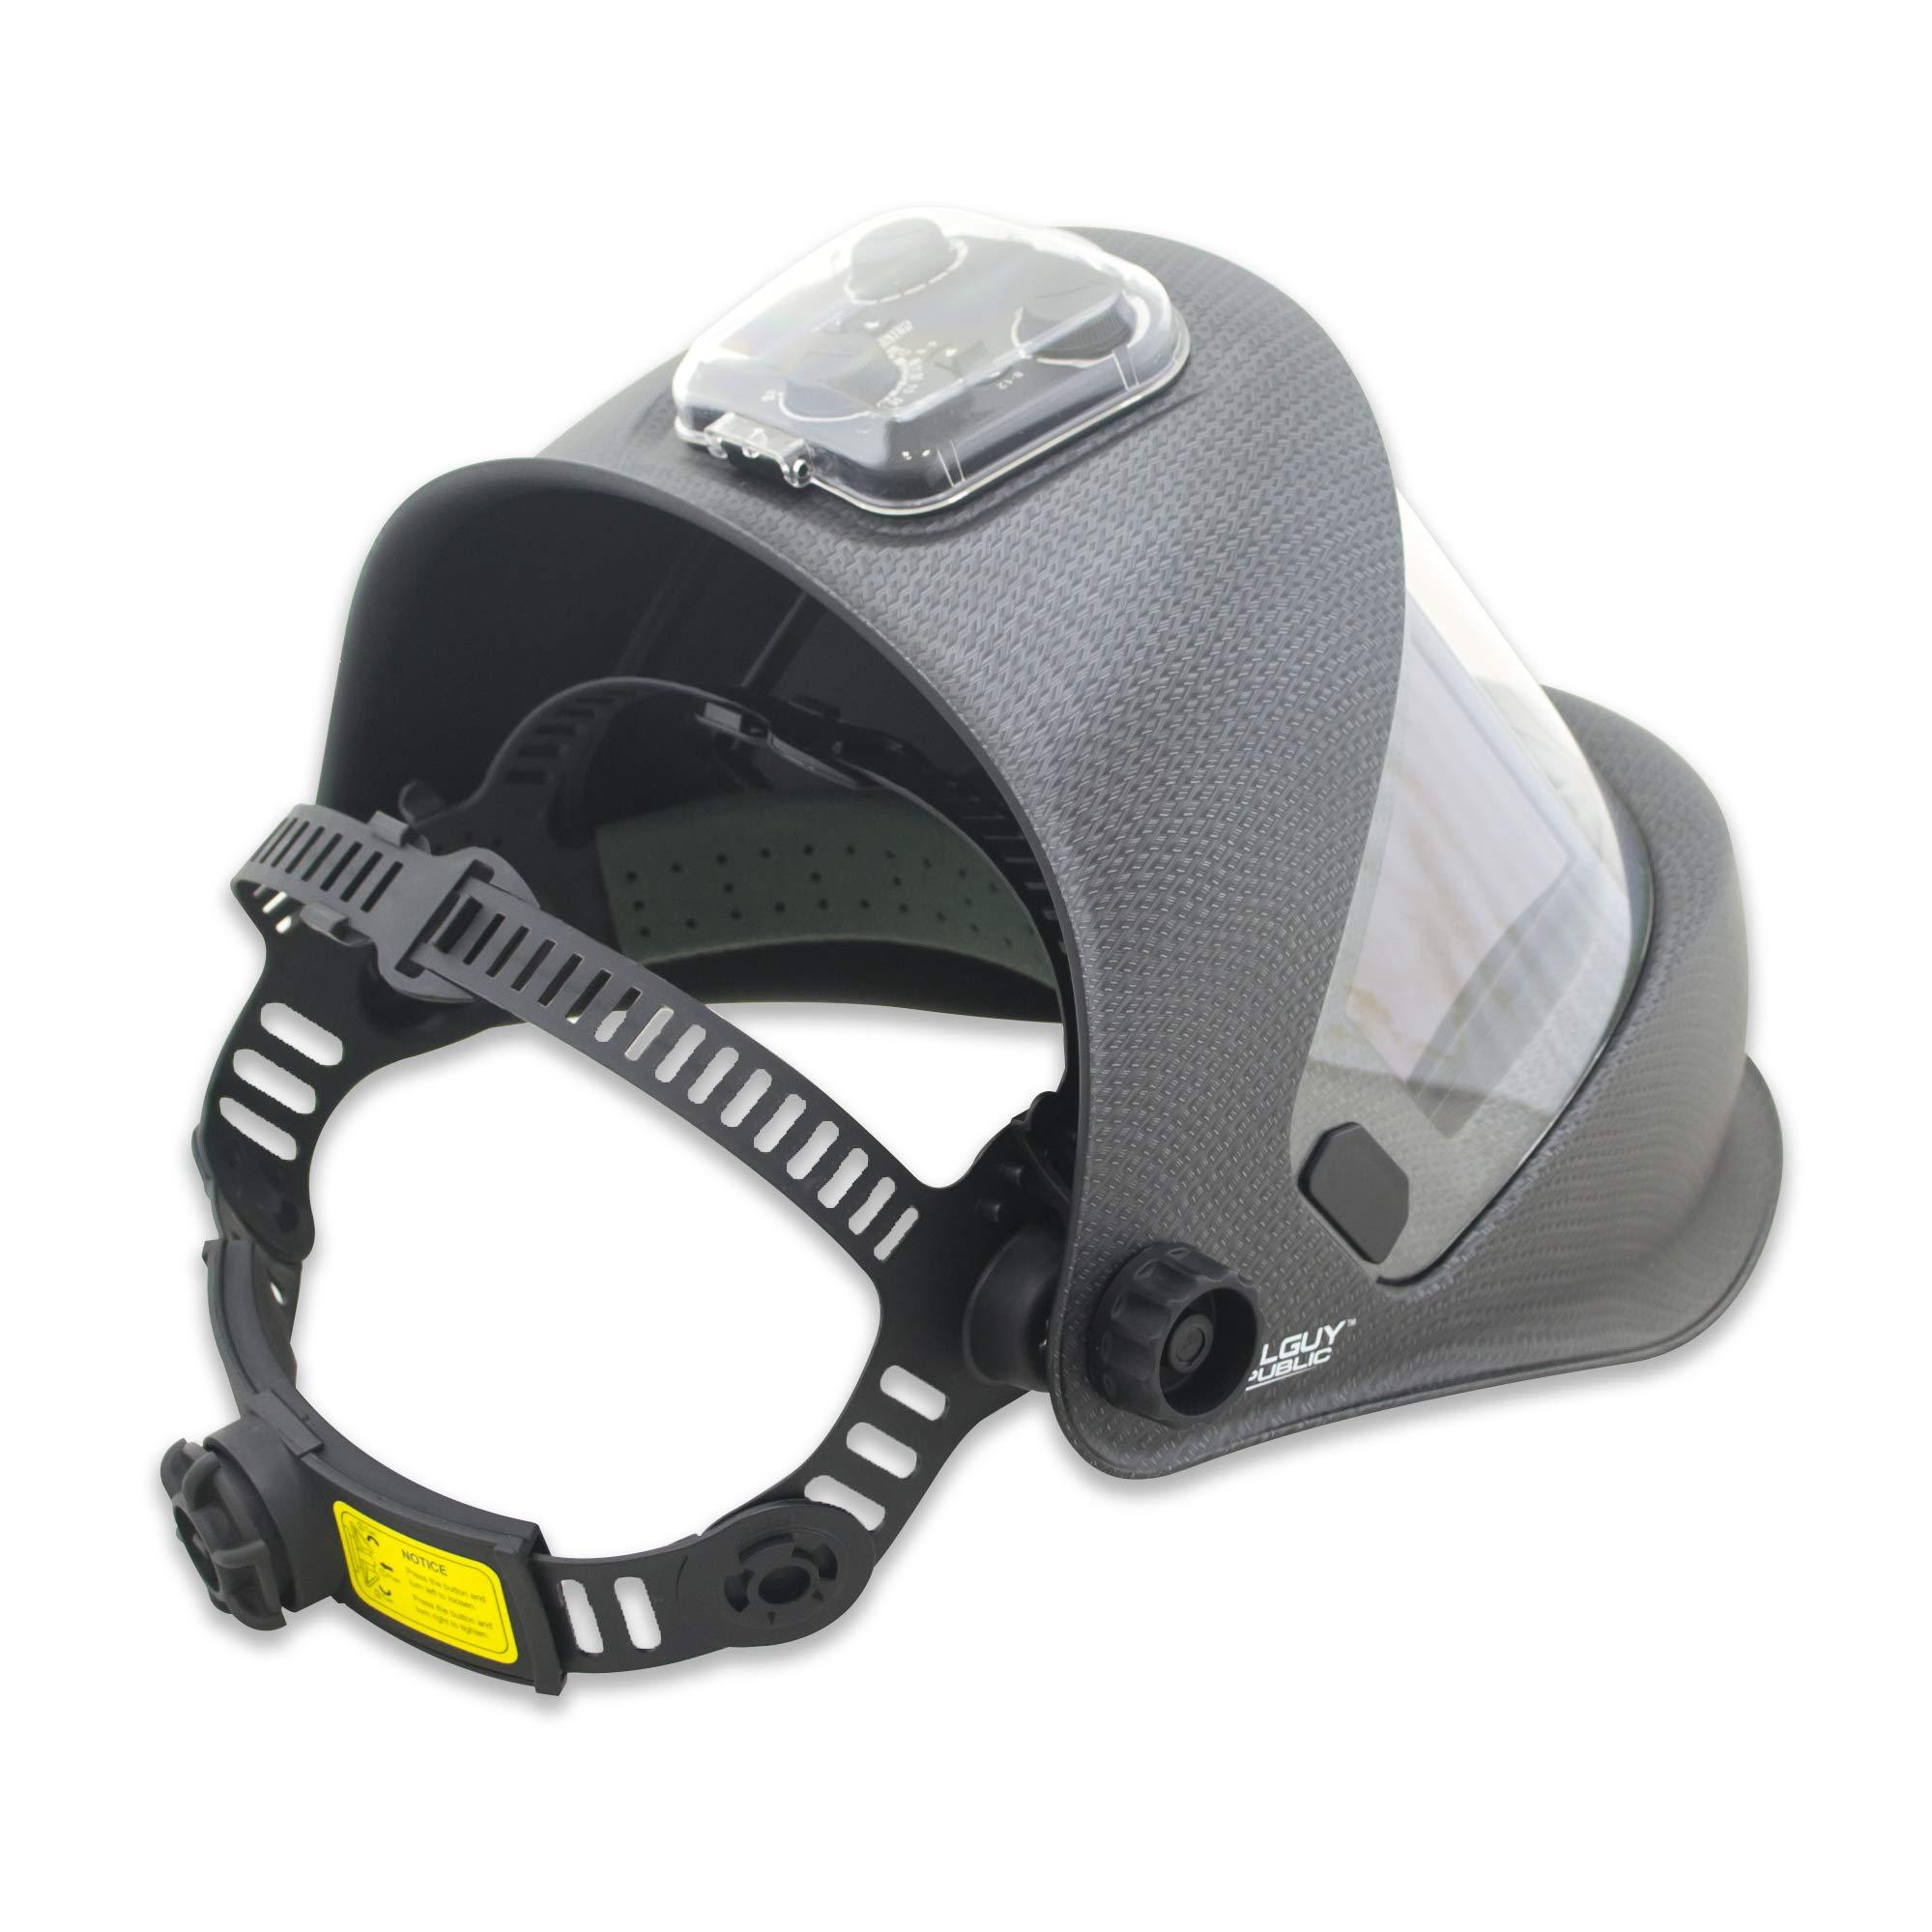 TGR Panoramic 180 View Solar Powered Auto Darkening Welding Helmet - True Color (MATTE CARBON FIBER) by Tool Guy Republic (Image #3)